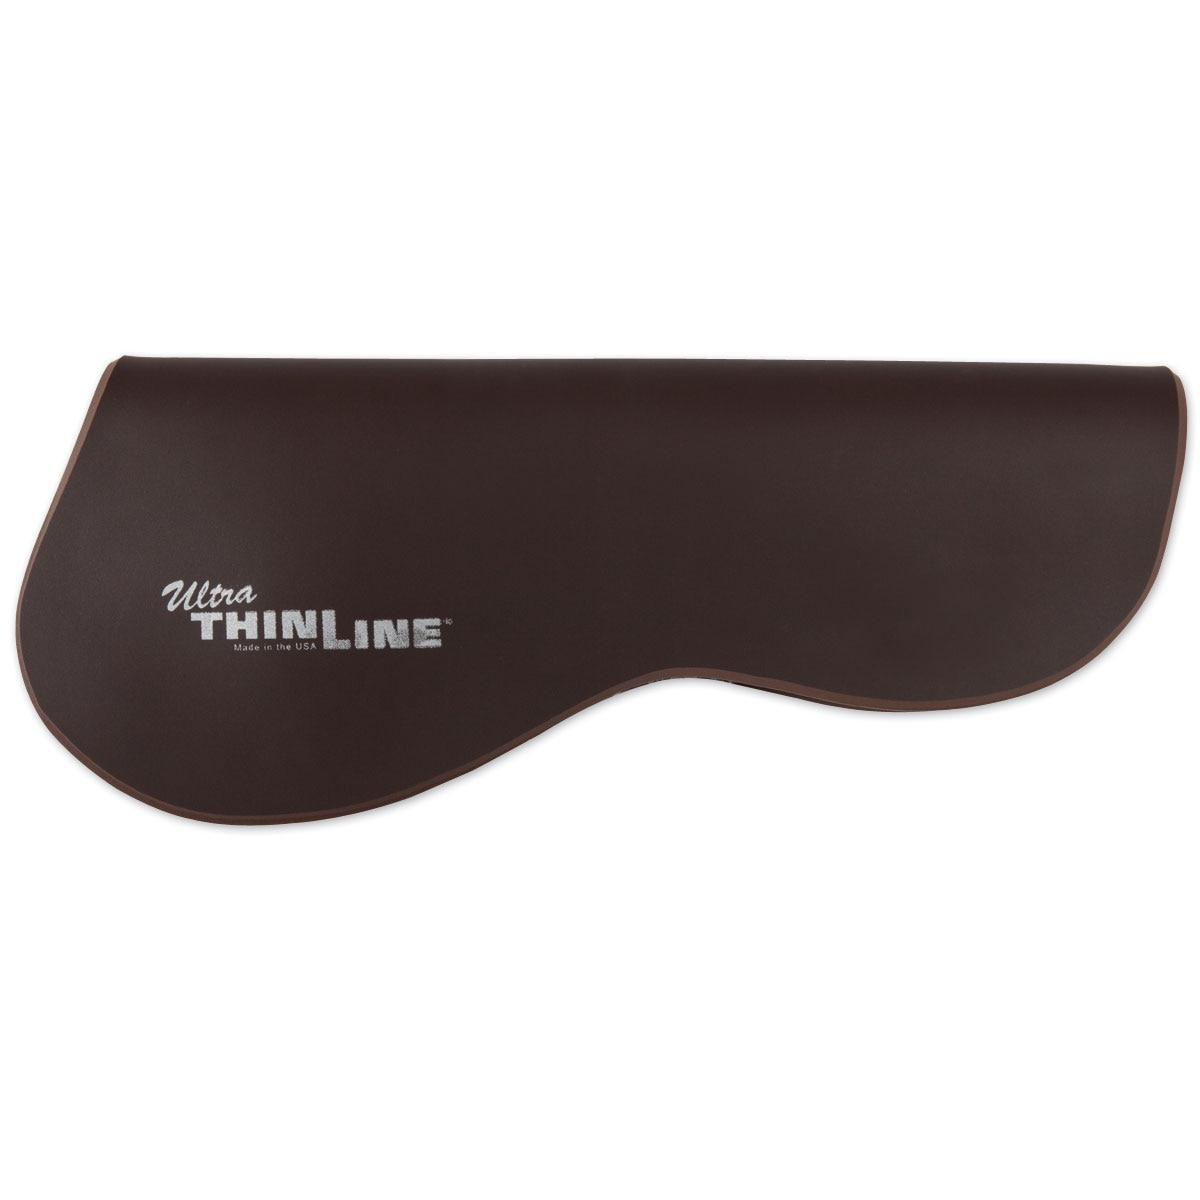 Ultra ThinLine Half Pad, Dark Brown - EXCLUSIVE!